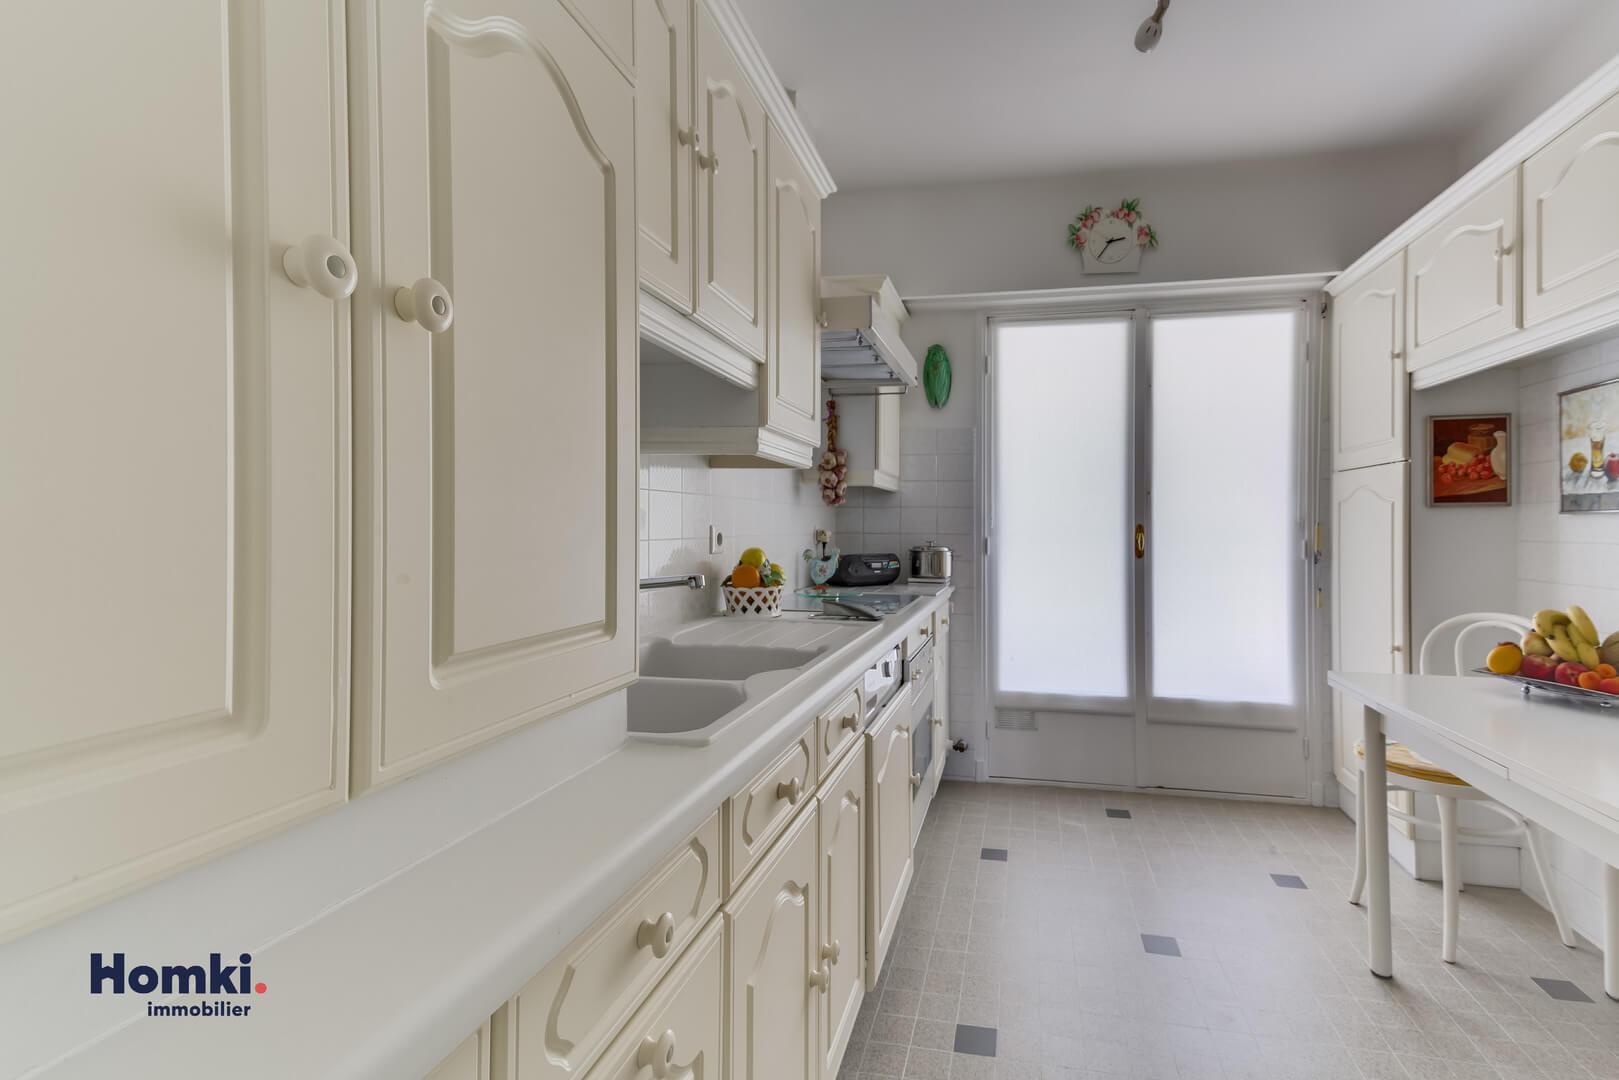 Vente appartement Grasse T3 06520 French Riviera_9